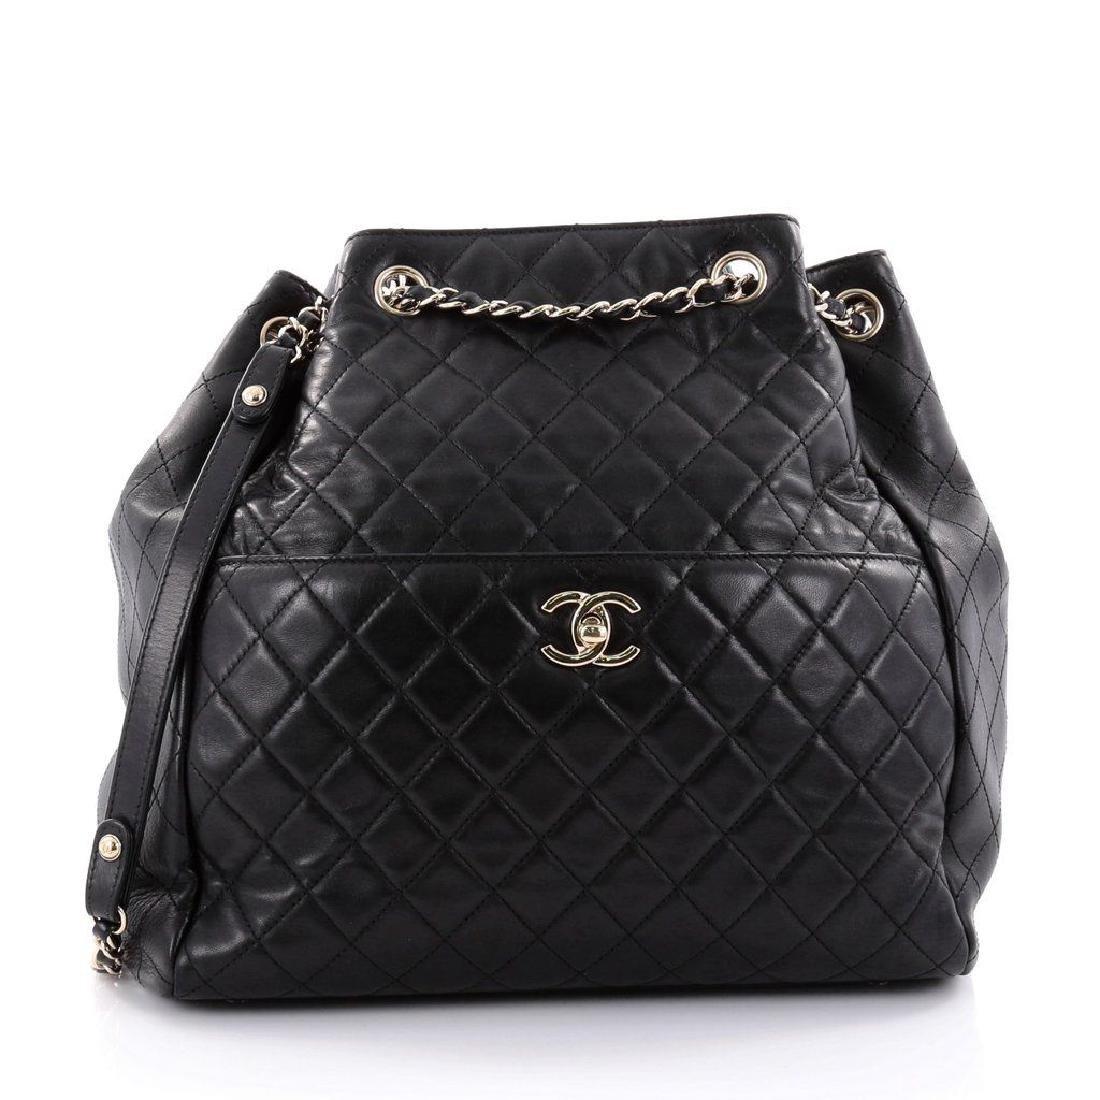 Chanel Lambskin Classic CC Drawstring Black Bucket Bag